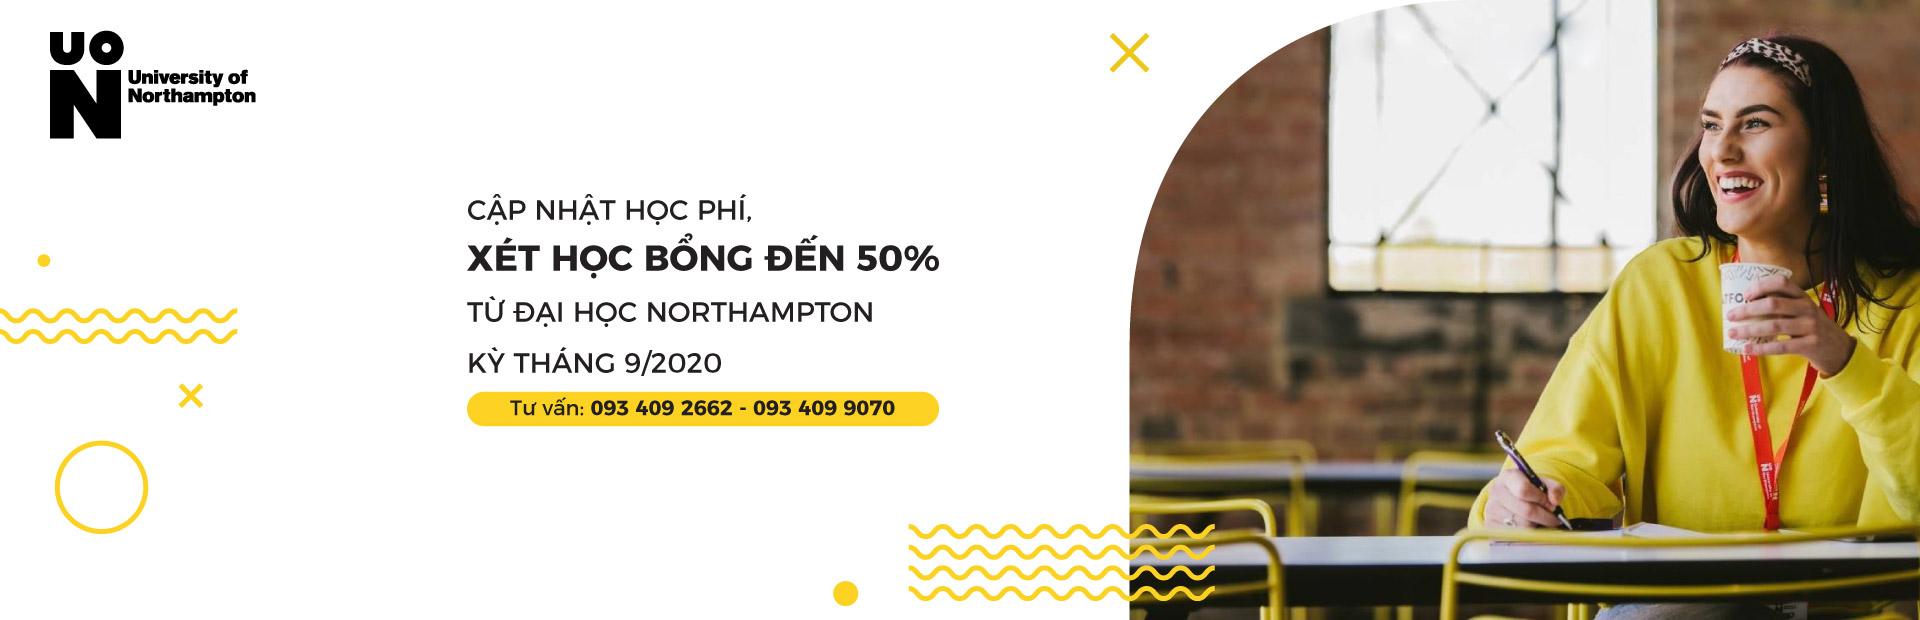 Northampton hoc bong